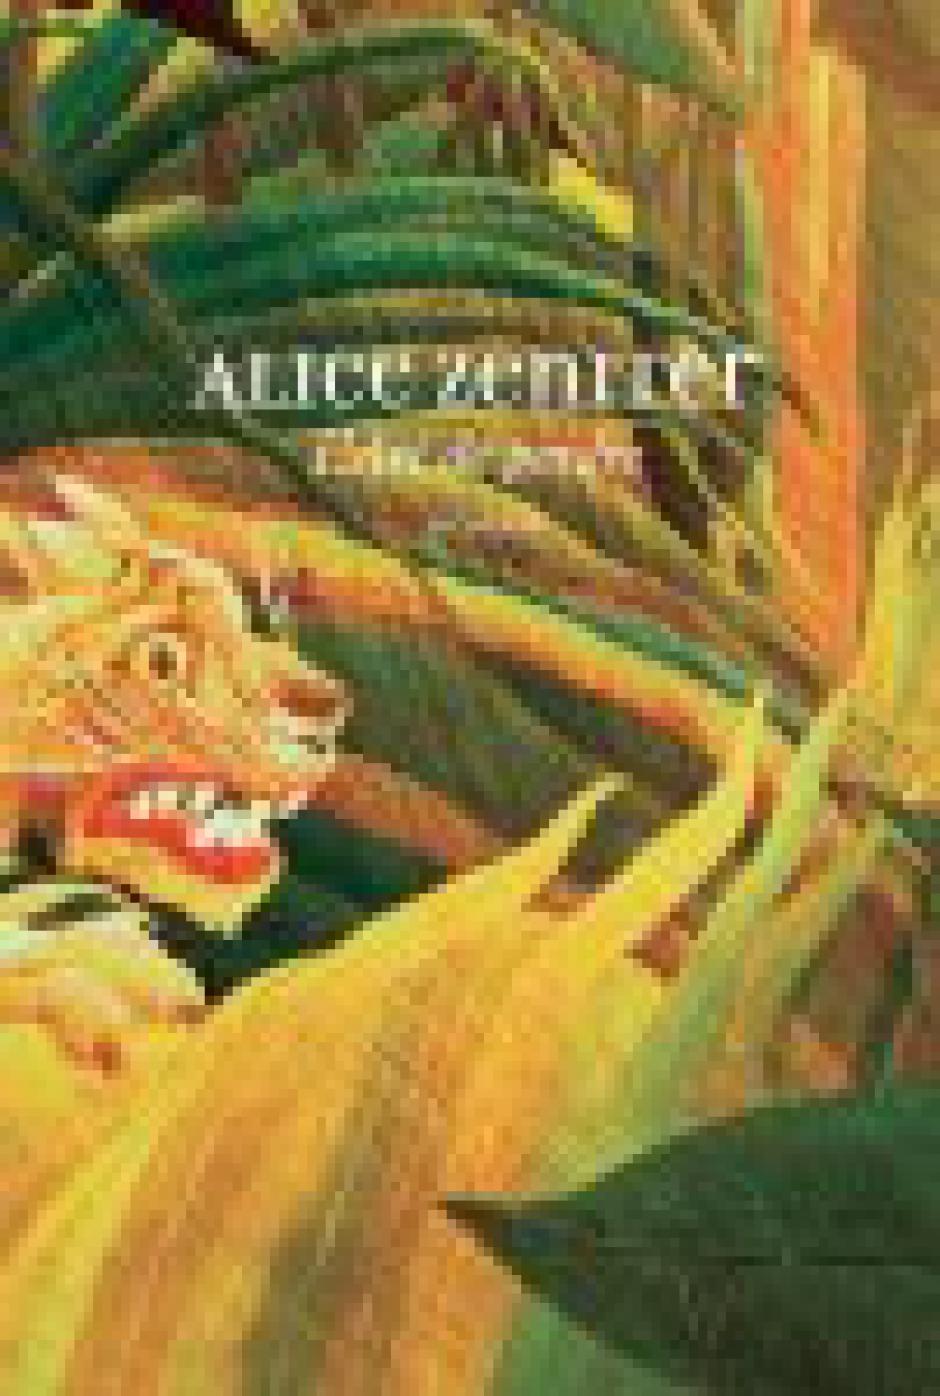 « L'ART DE PERDRE » d'Alice Zéniter Mardi 28 juillet 2020, par  Mireille Popelin